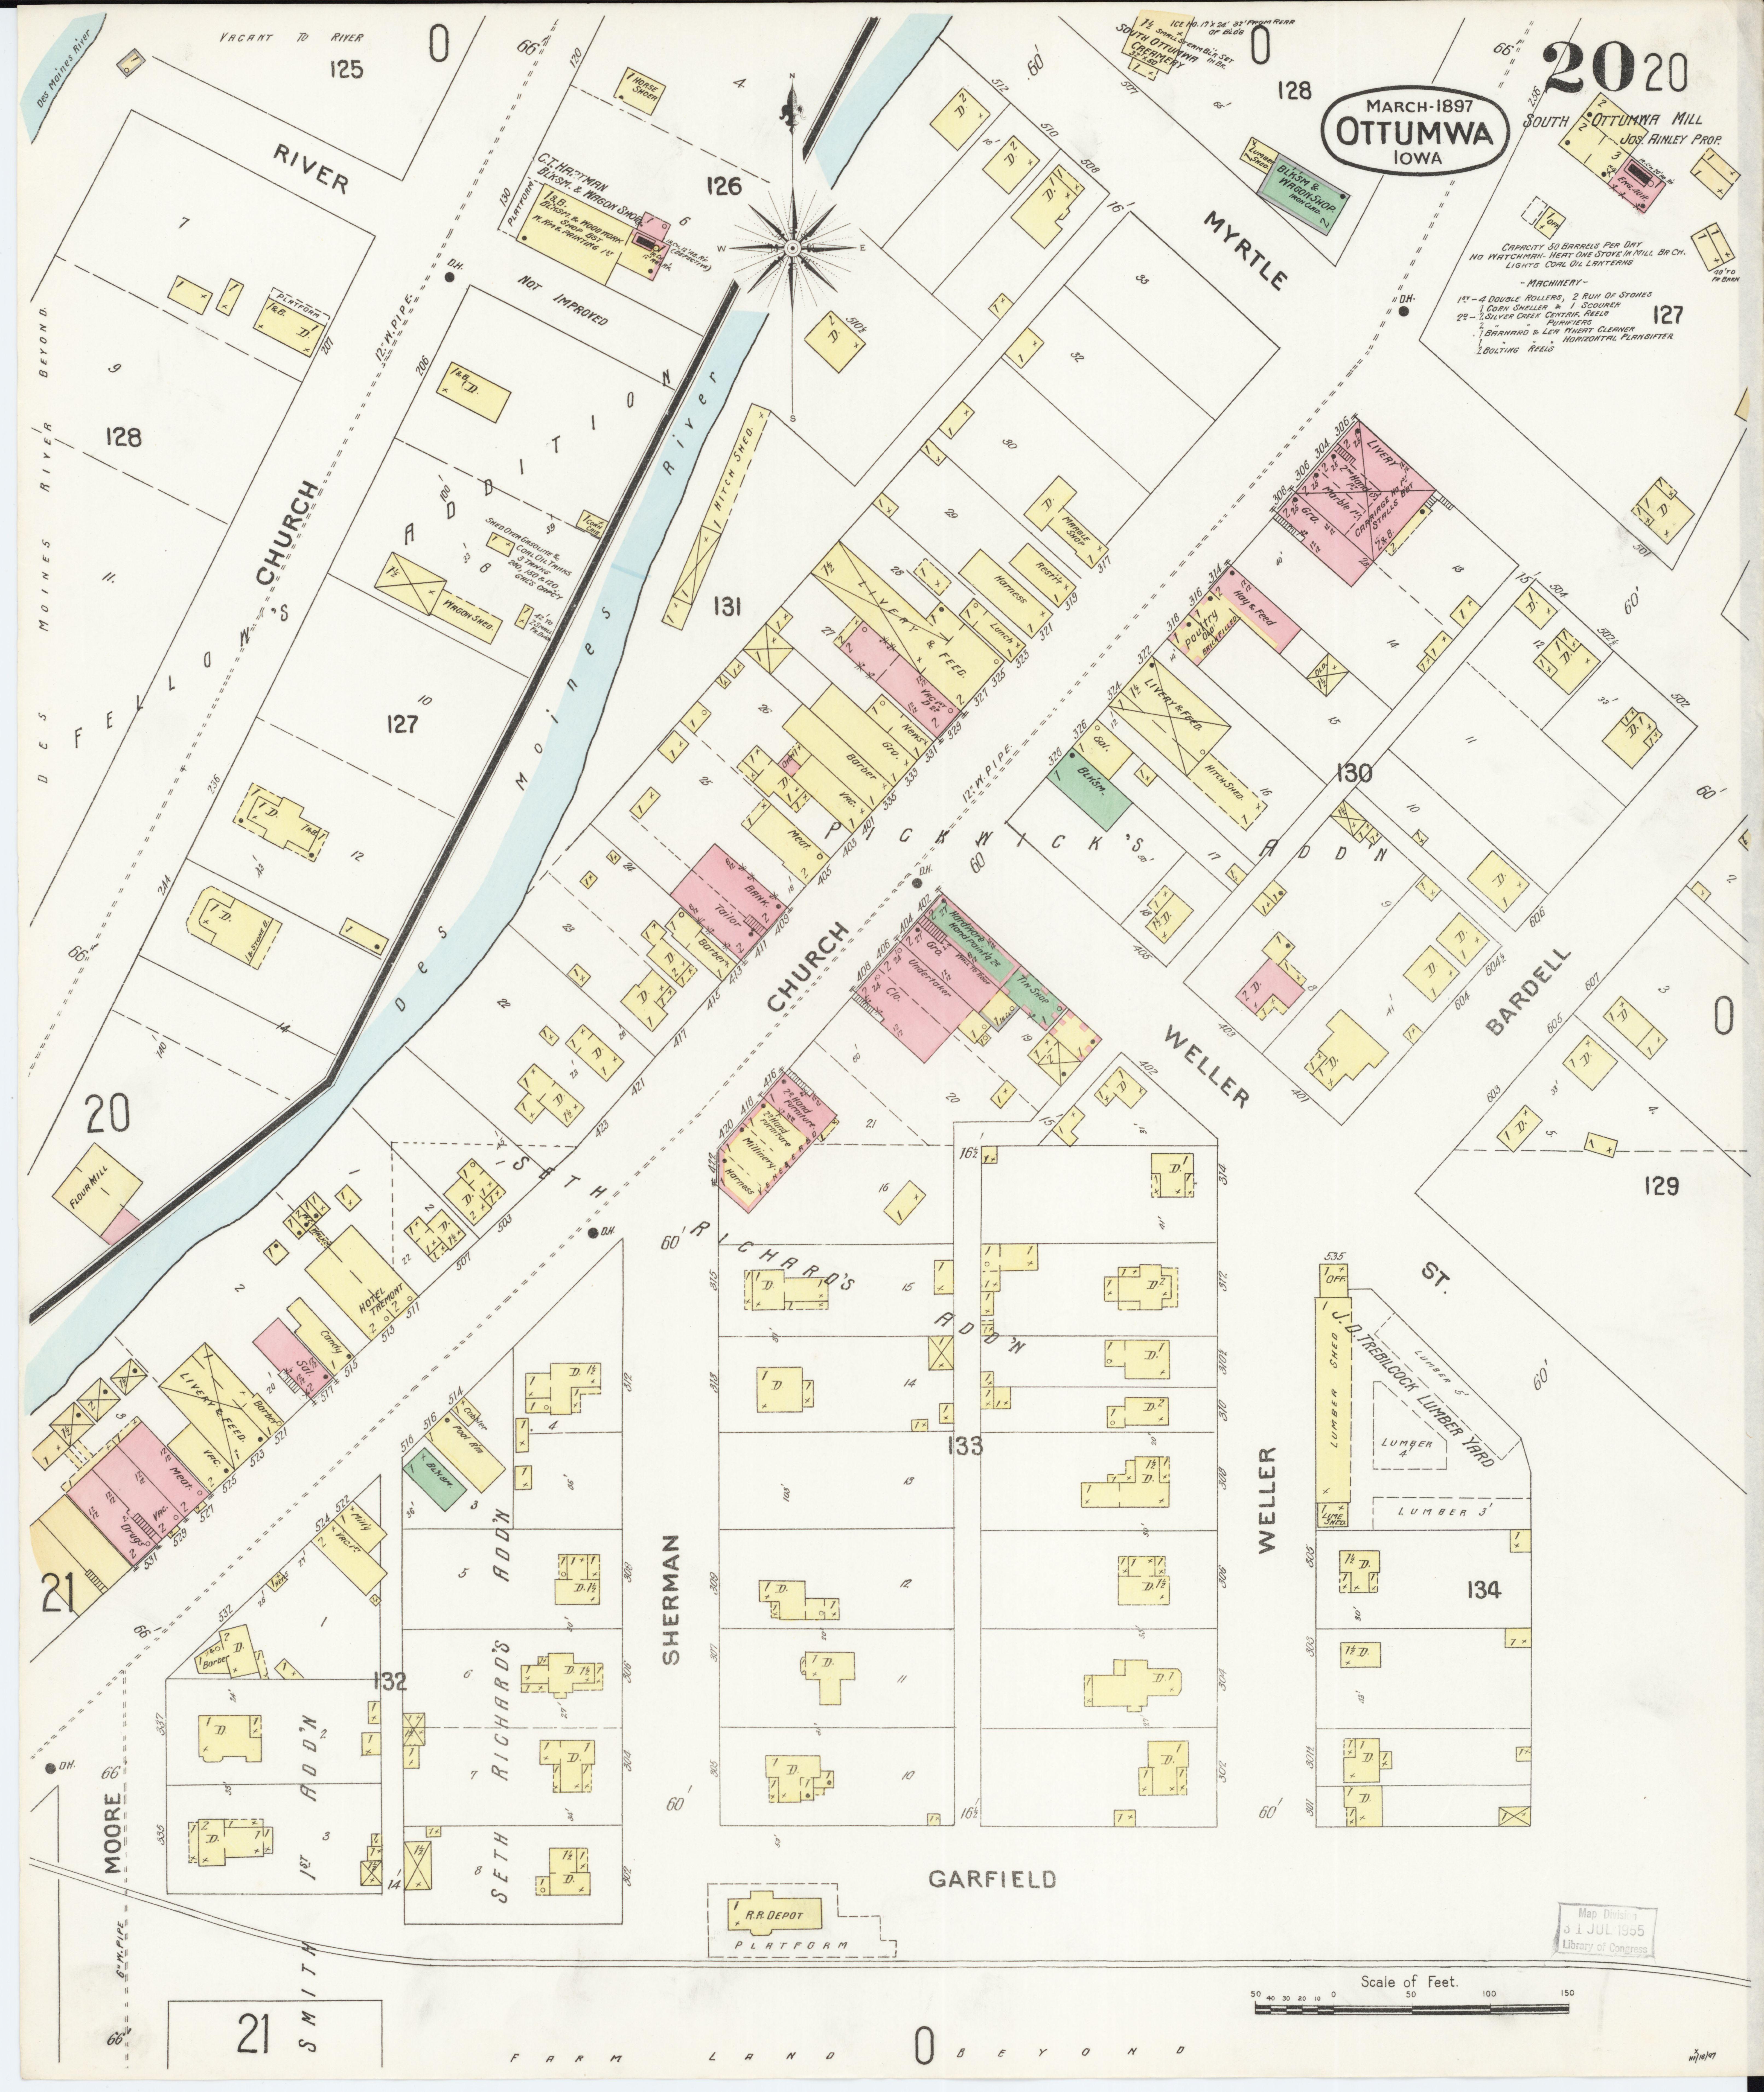 File:Sanborn Fire Insurance Map from Ottumwa, Wapello County ... on iowa map by county, davenport iowa map, iowa roadway map, wisconsin central map, iowa map of america, iowa driving map, iowa travel map, iowa map usa, i-80 map, western railway of alabama map, ne iowa map, iowa metro map, iowa road map, iowa maps with major cities, iowa utility map, google maps iowa street map, illinois railway museum map, east broad top map, saint charles county zip code map, iowa map with mile markers,